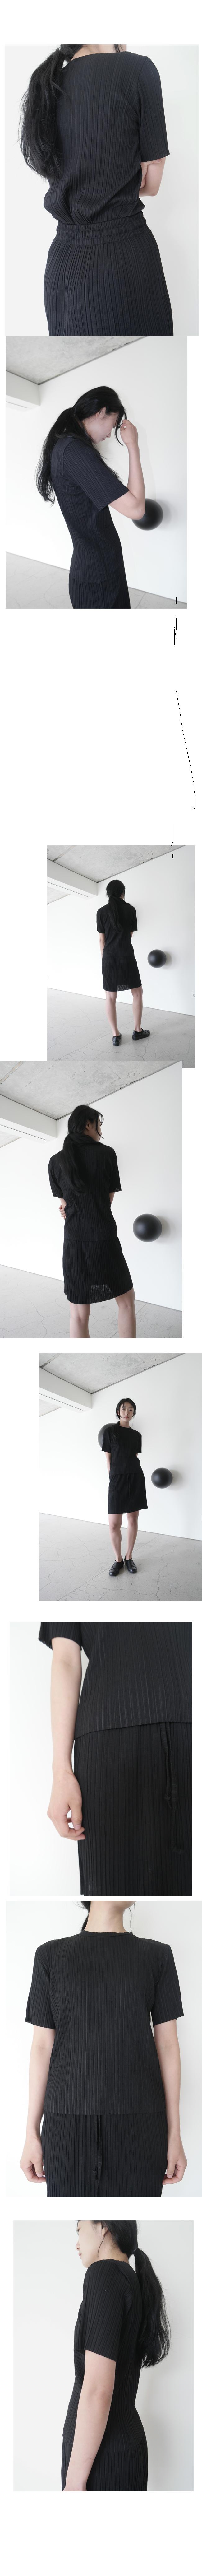 jaunty pleats set - skirt only